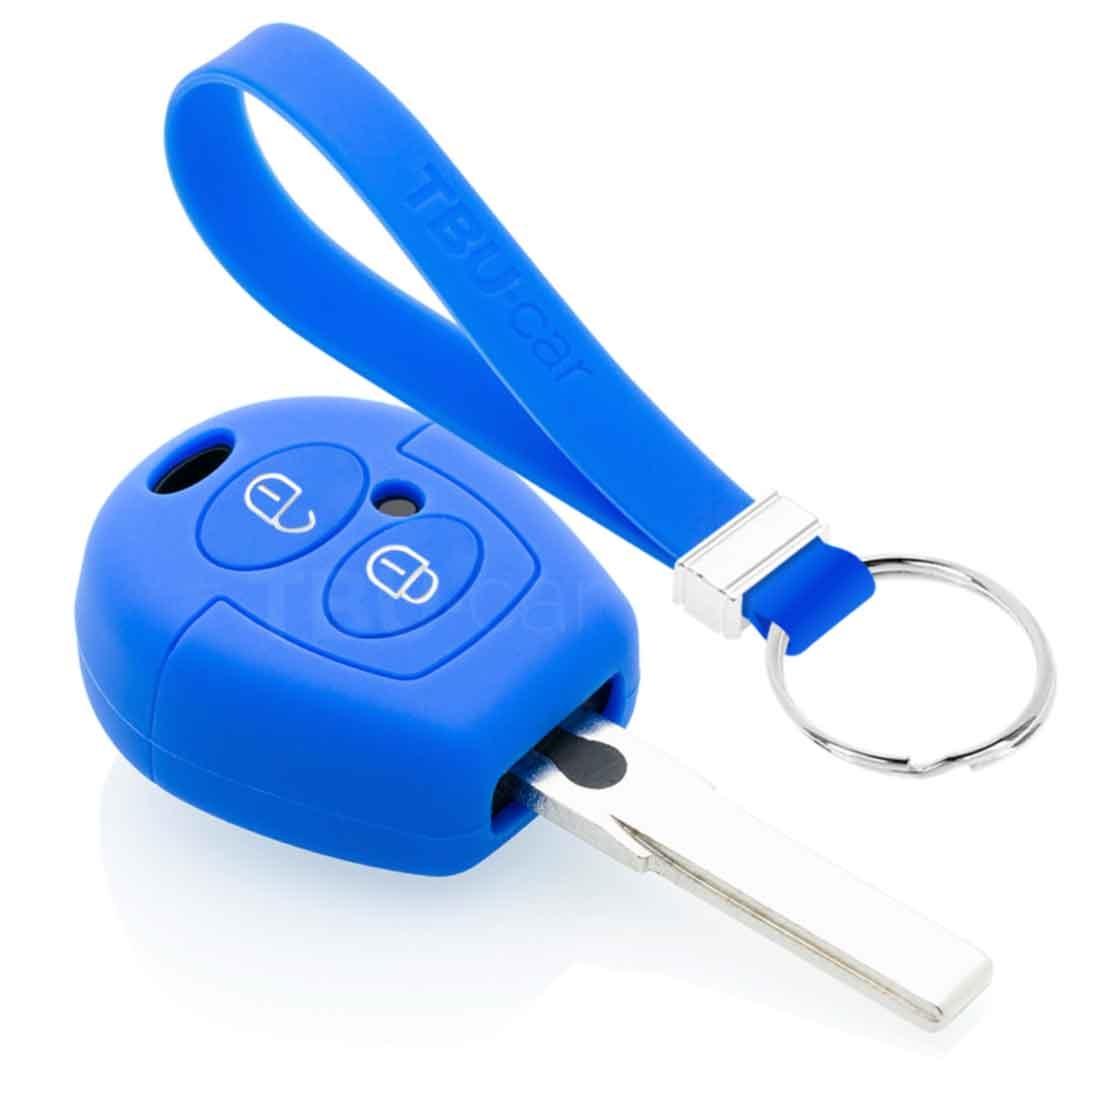 TBU car TBU car Autoschlüssel Hülle kompatibel mit Skoda 2 Tasten - Schutzhülle aus Silikon - Auto Schlüsselhülle Cover in Blau